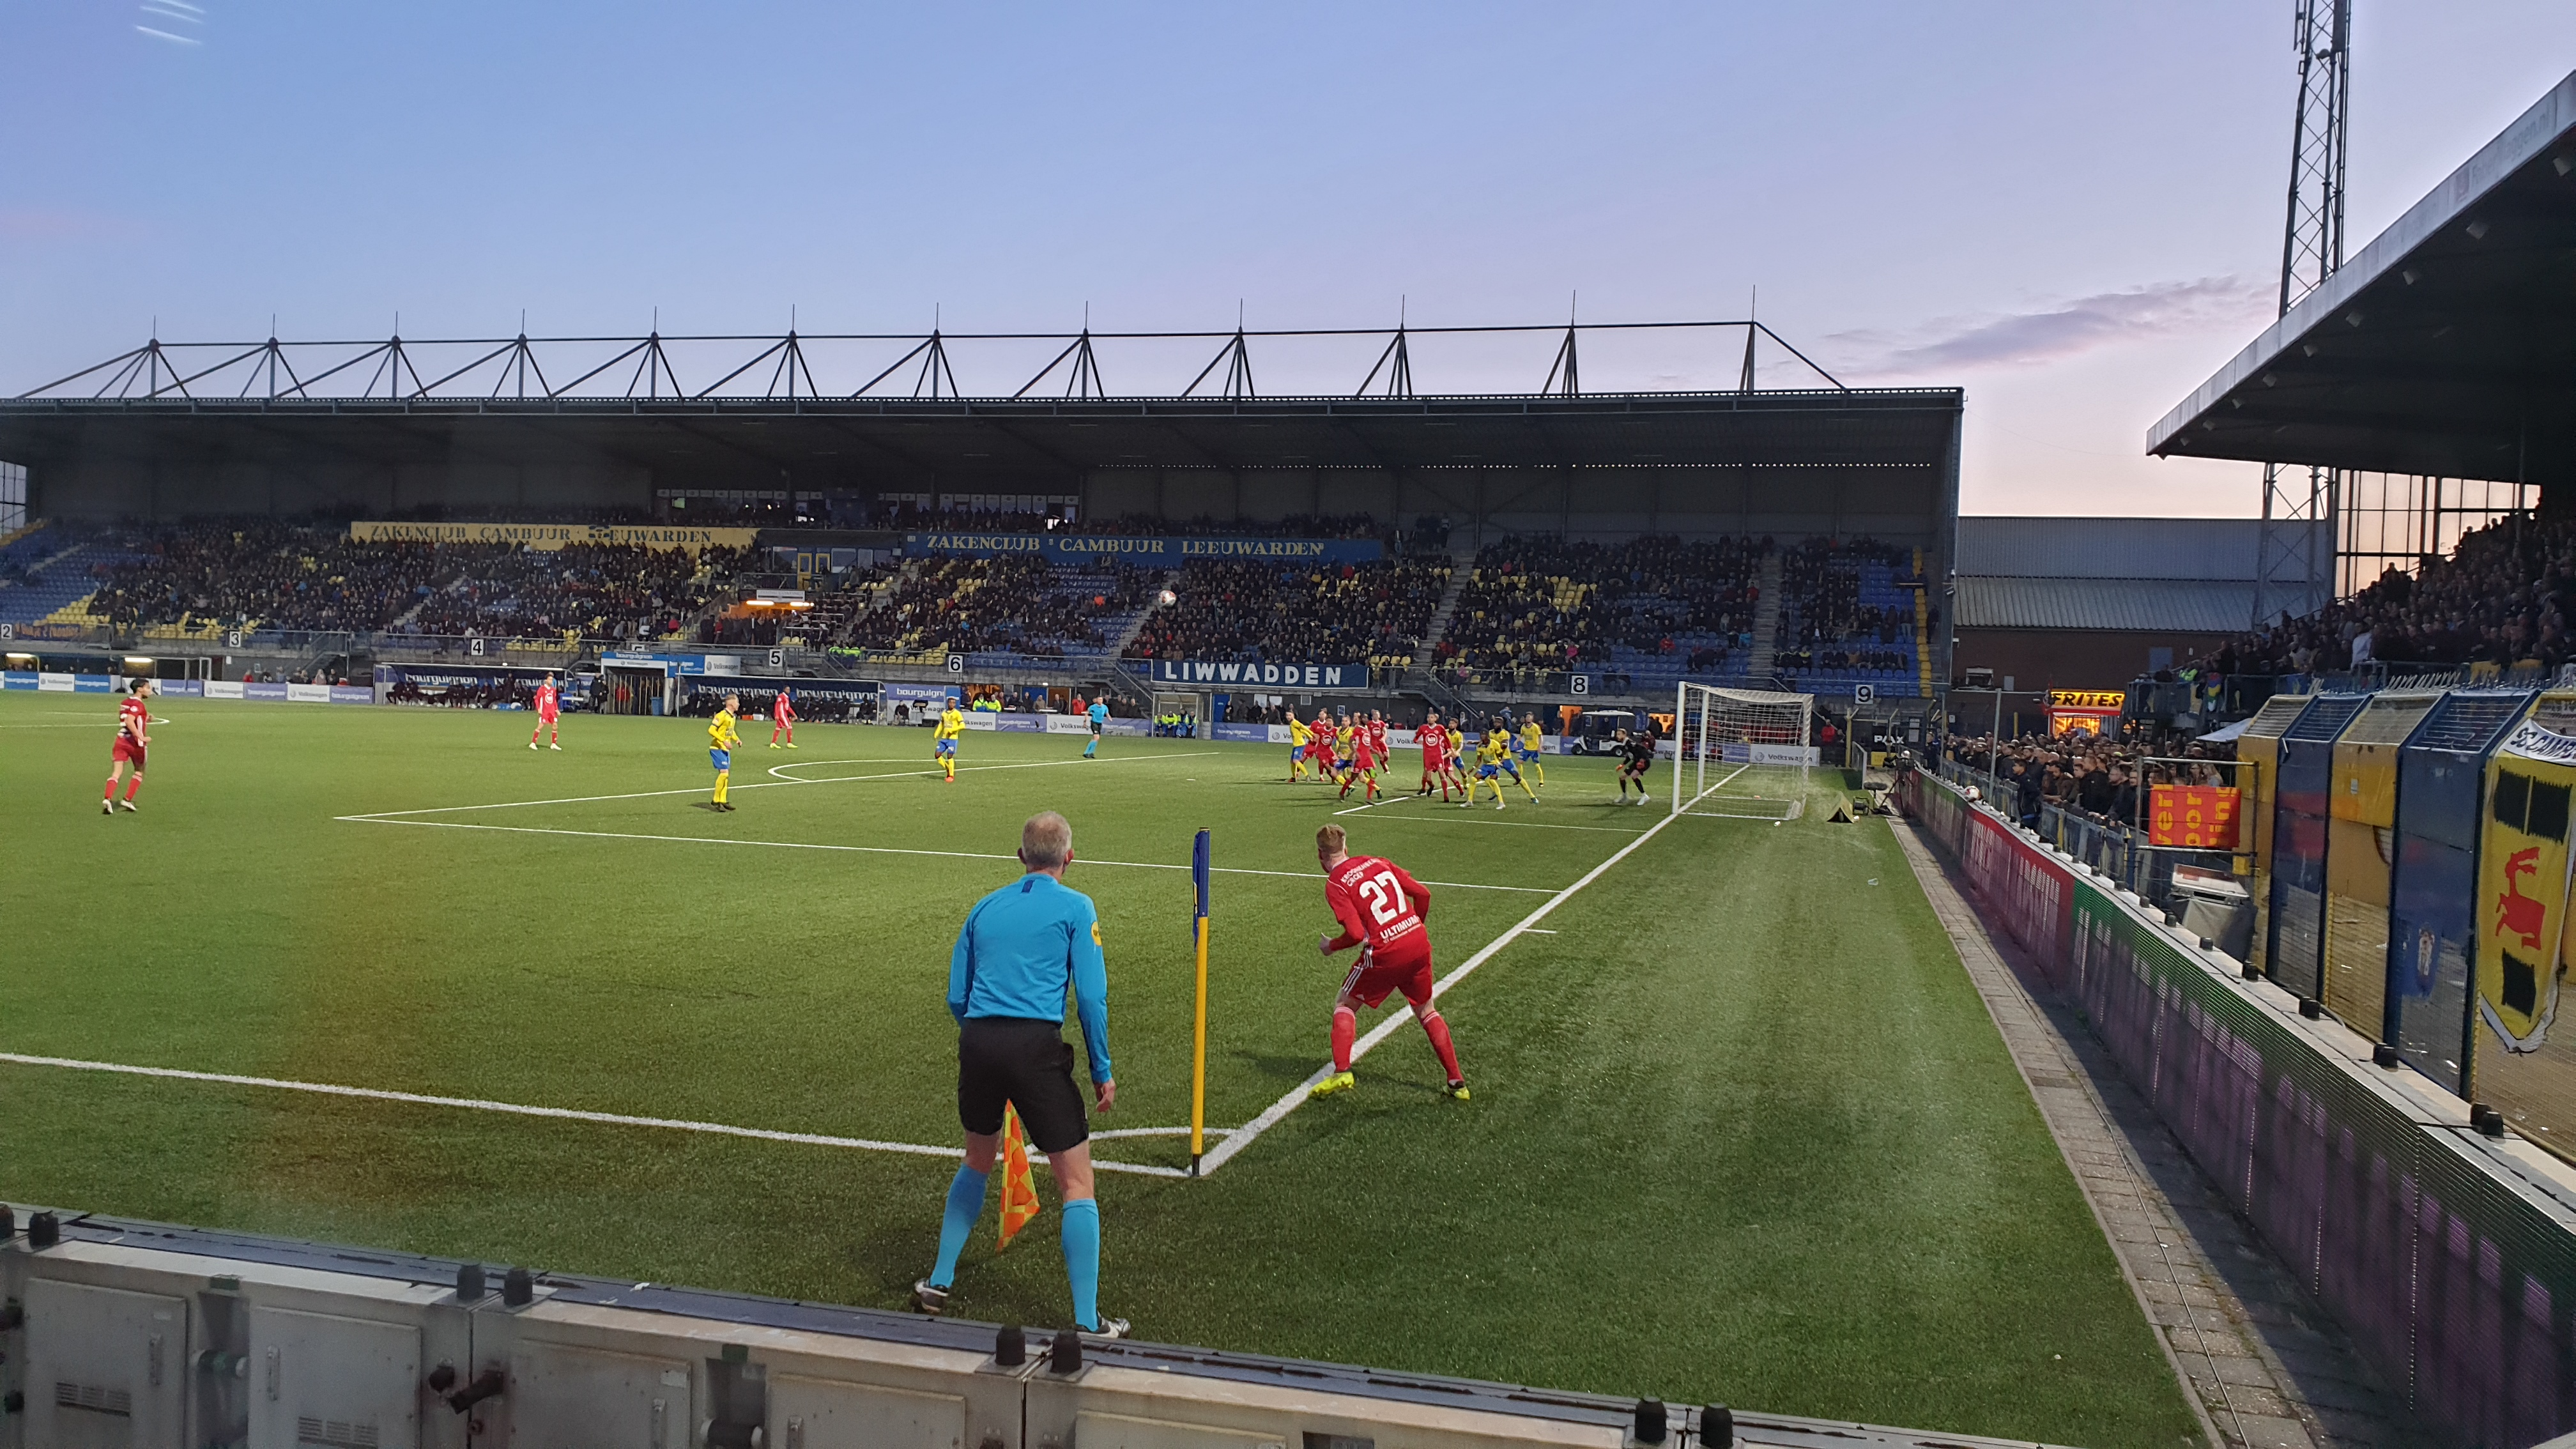 Almere City FC begint play-offs met remise tegen Cambuur